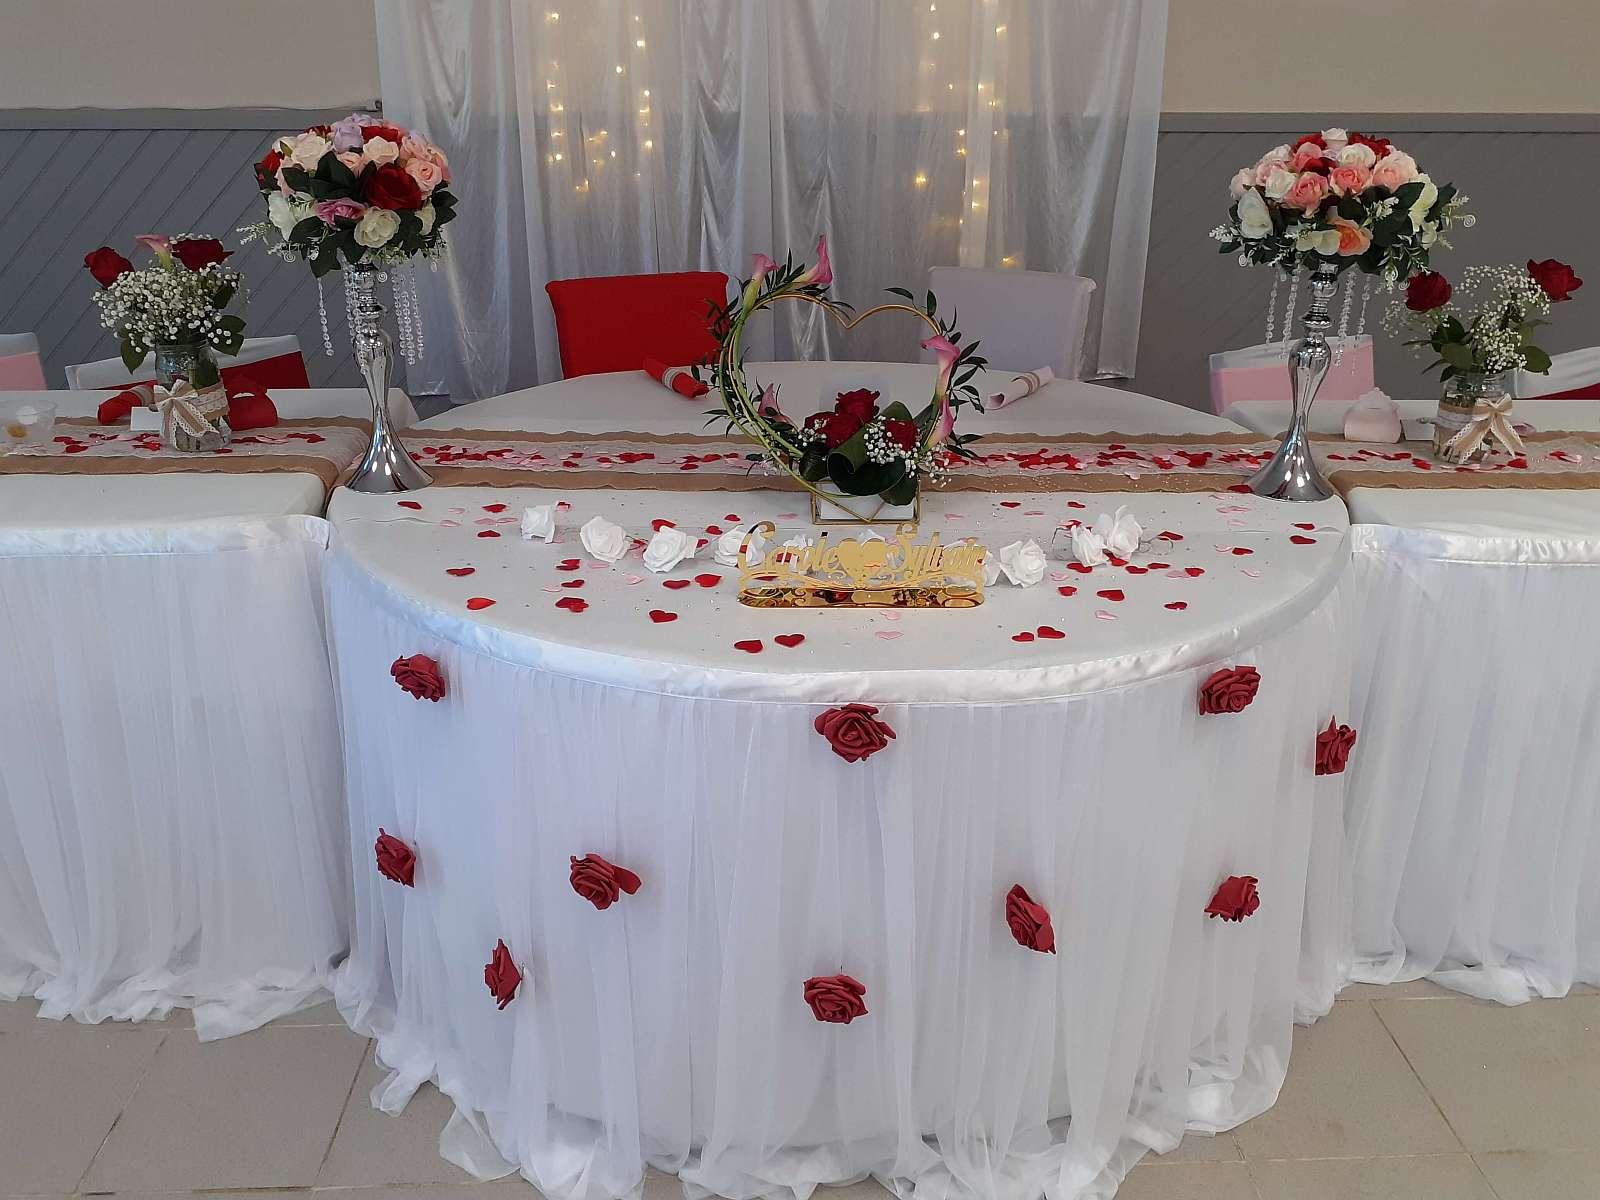 Mariage du 11 Juillet 2020 - La table ronde